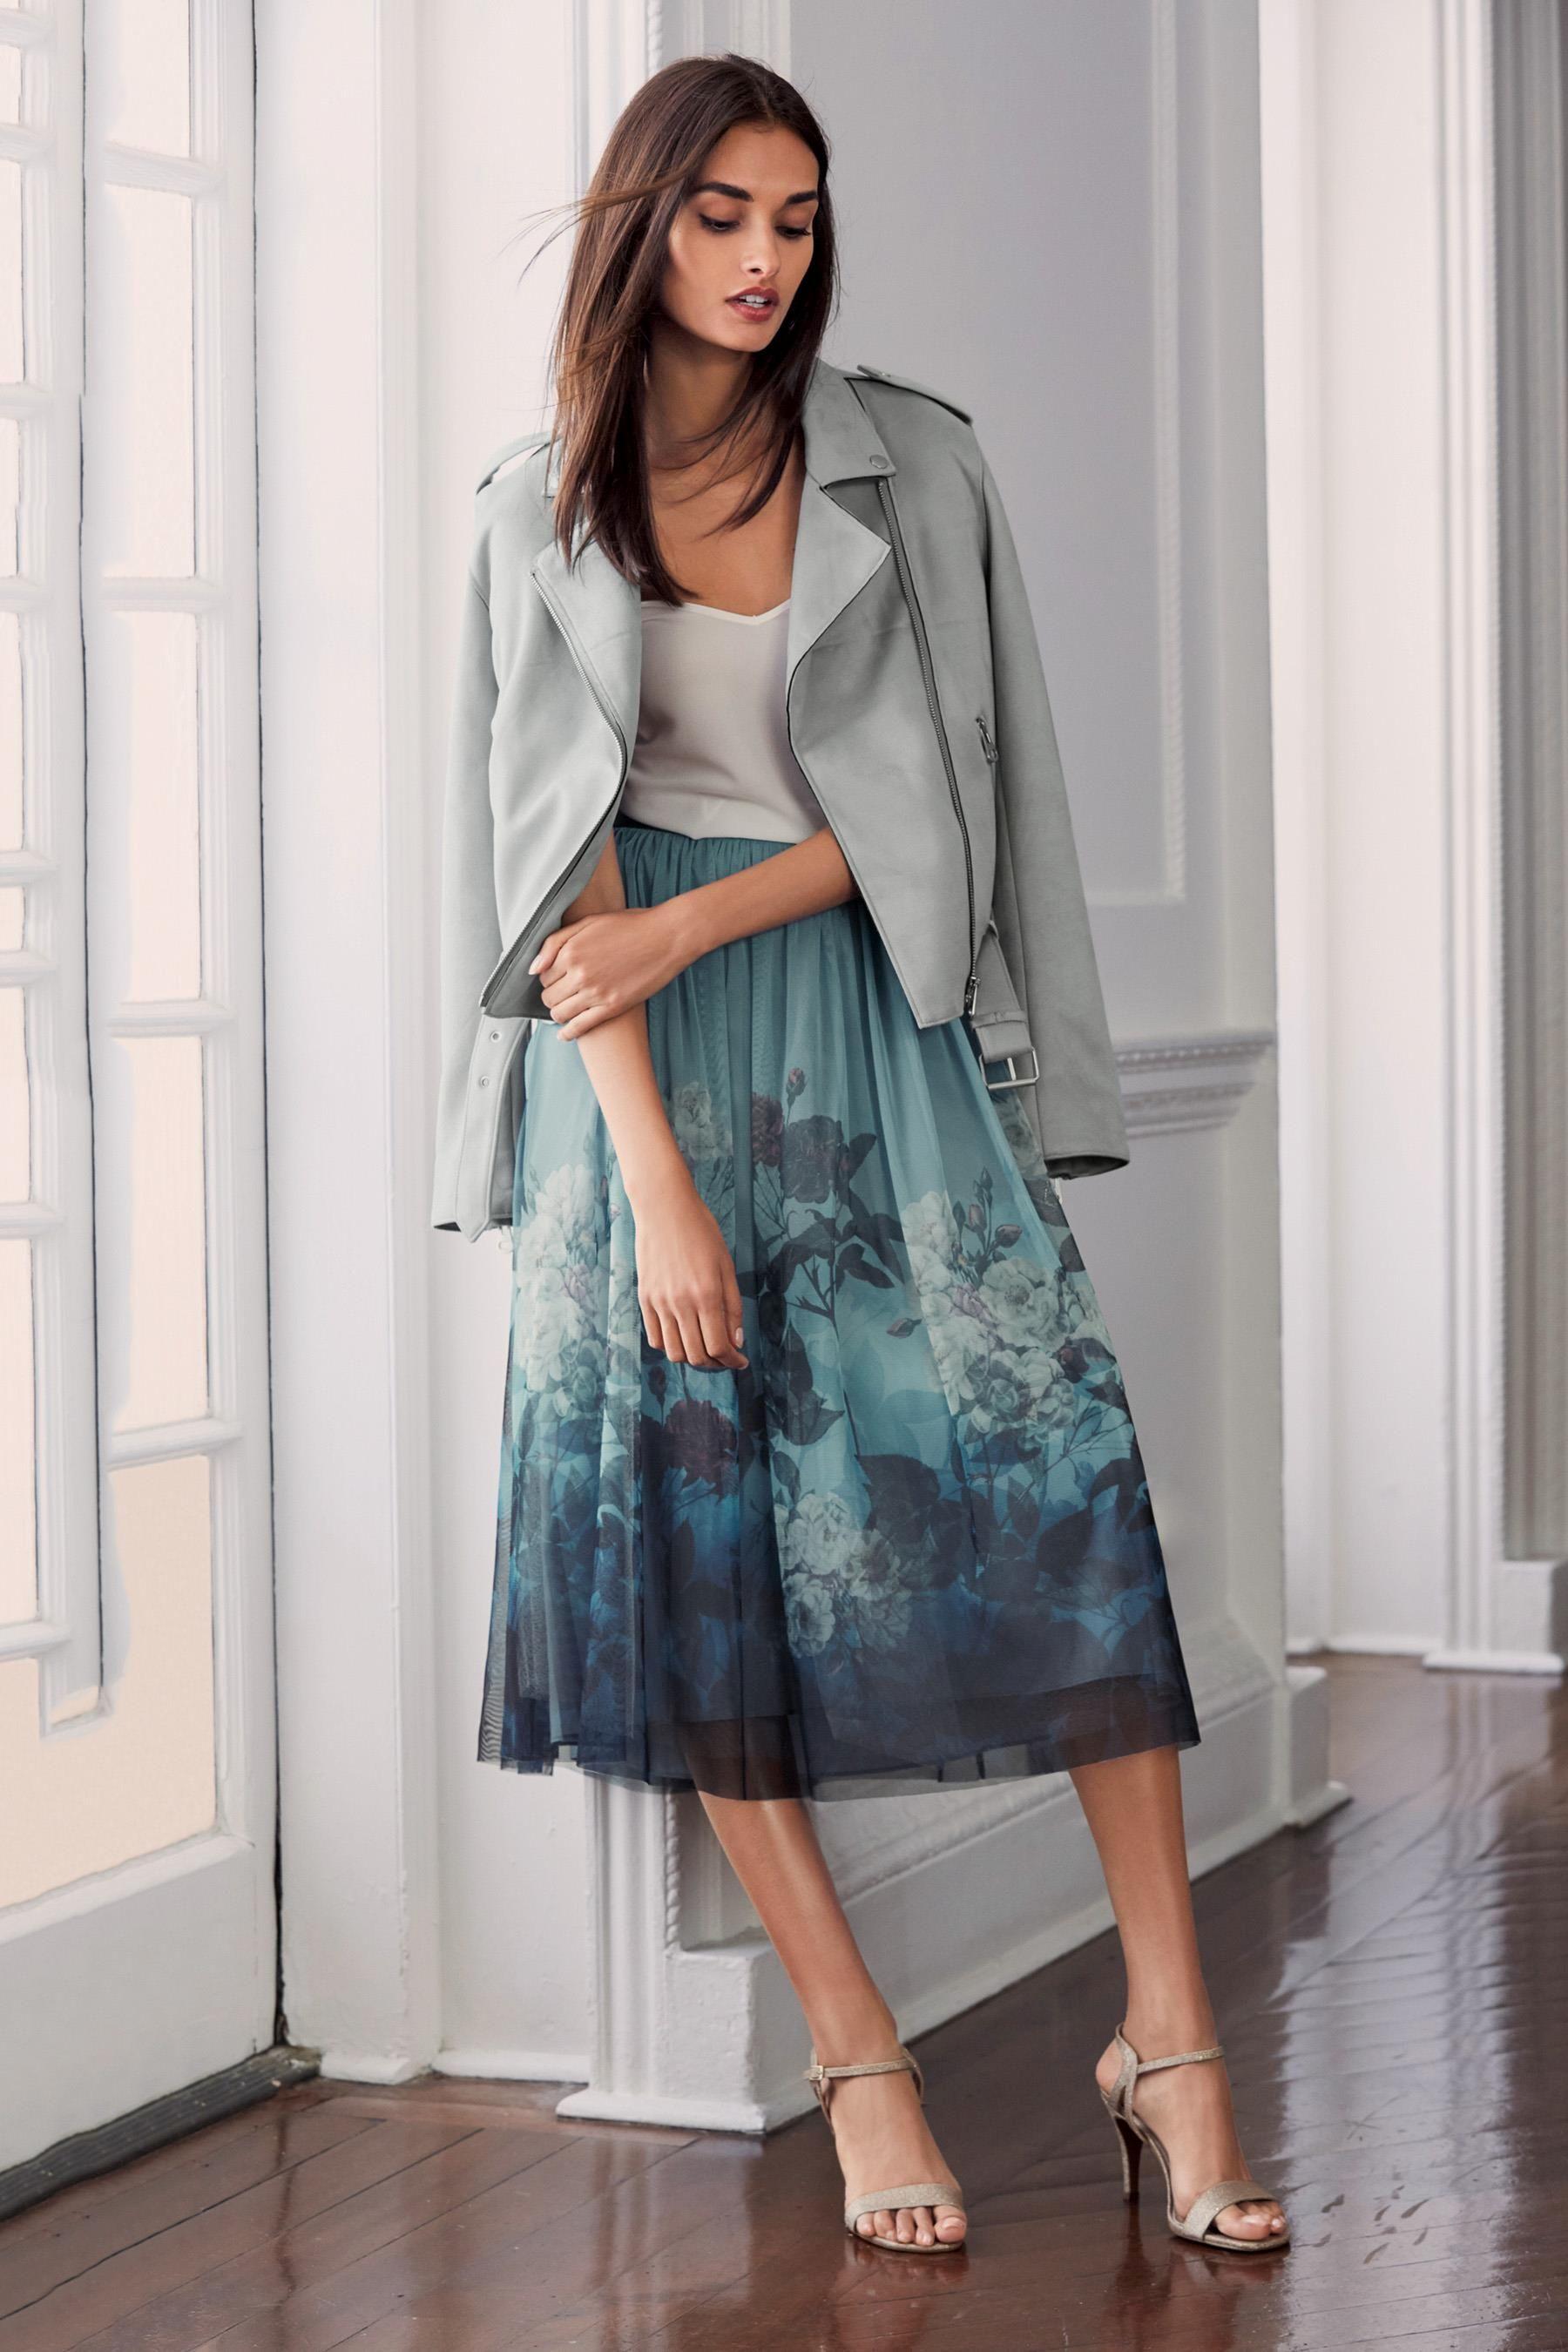 2077cb5fe Buy Blue/Black Printed Mesh Skirt from the Next UK online shop ...